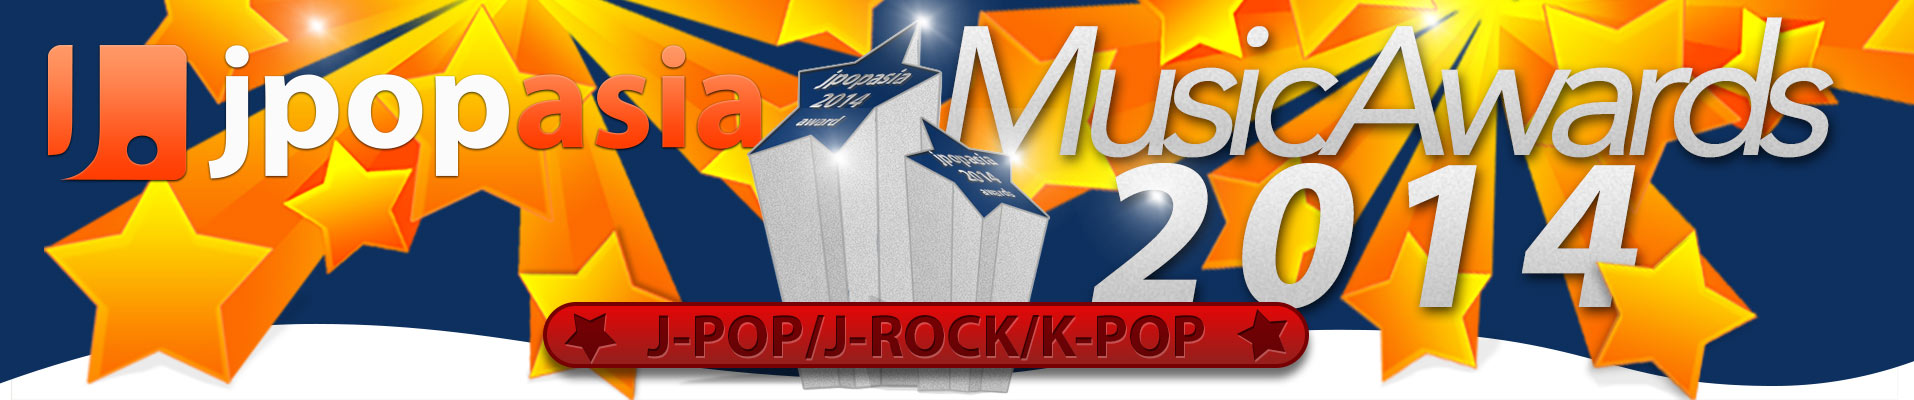 JpopAsia Music Awards 2014